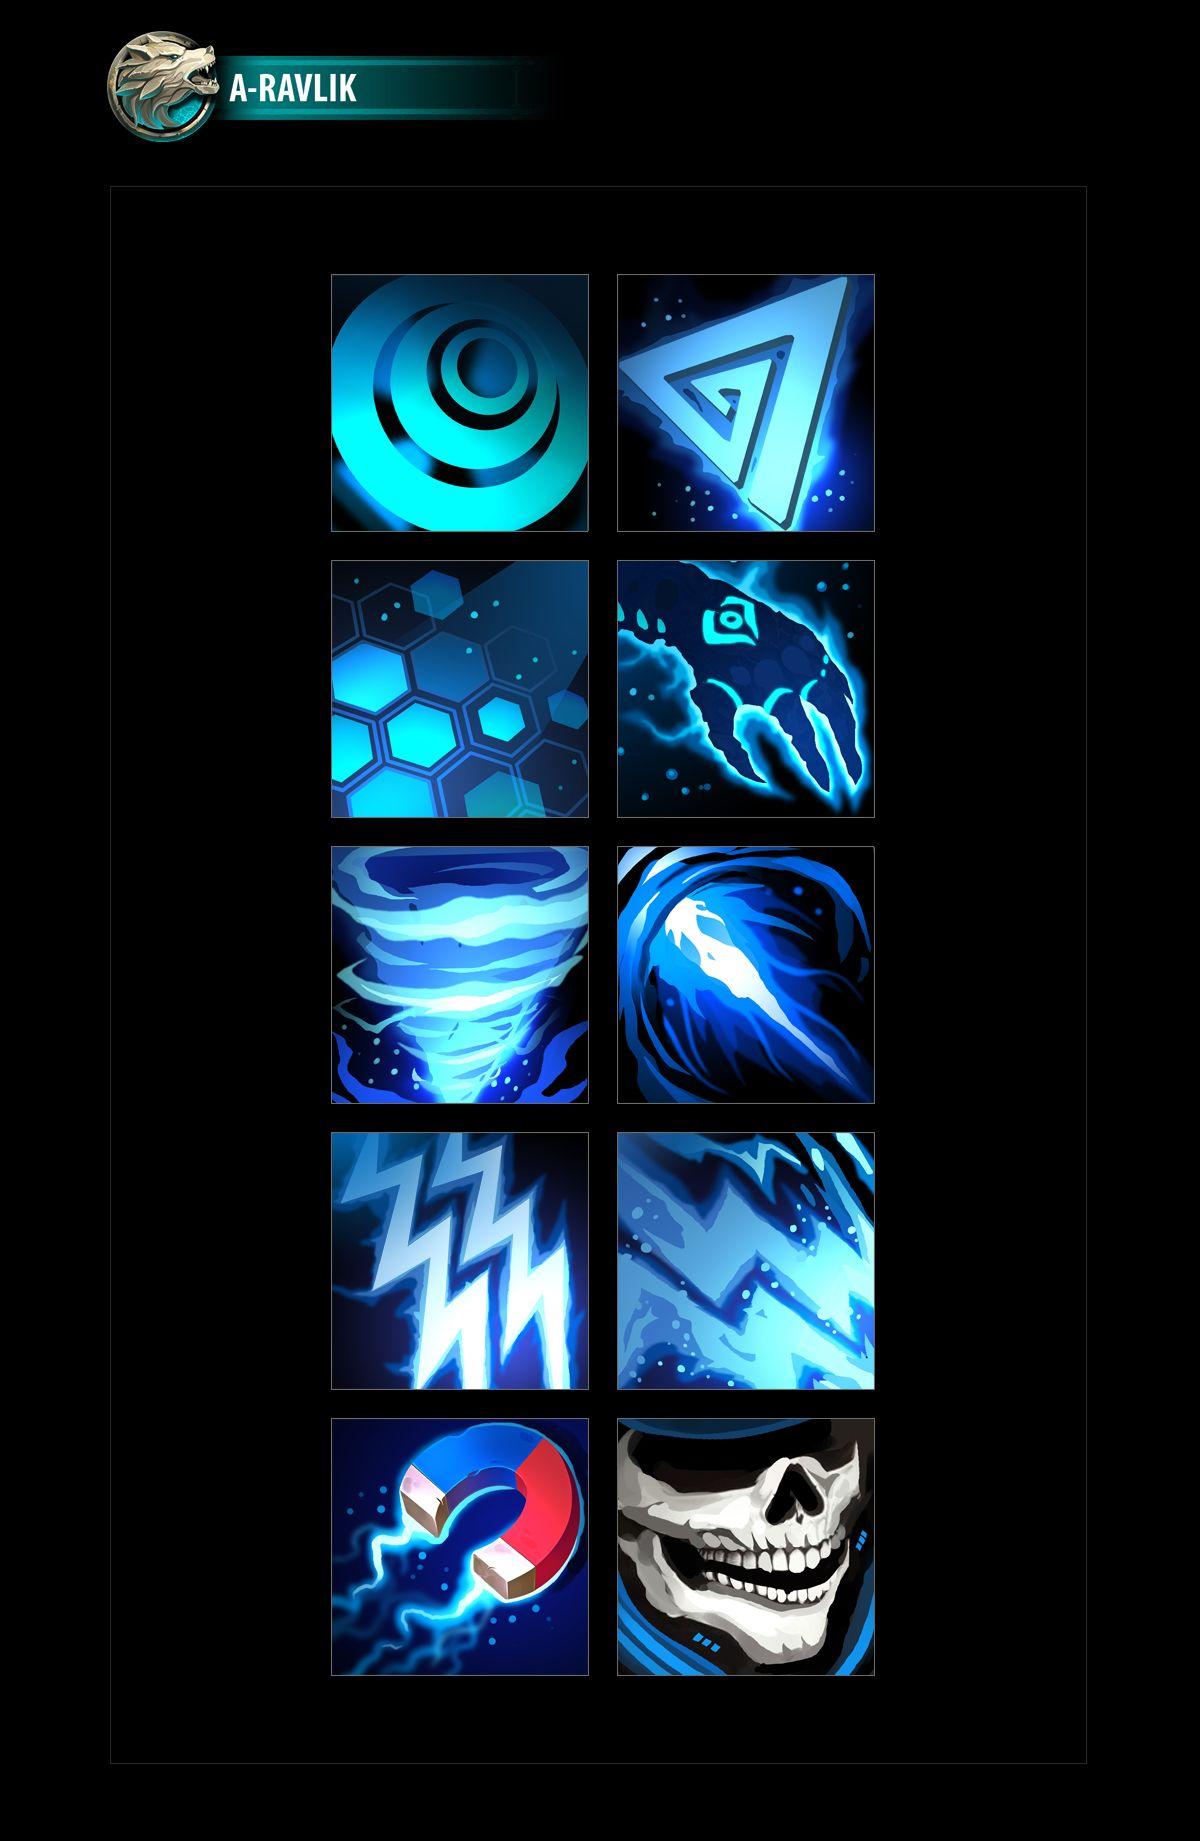 SciFi Ability Icons 02 in 2020 Icon, Sci fi, Game icon